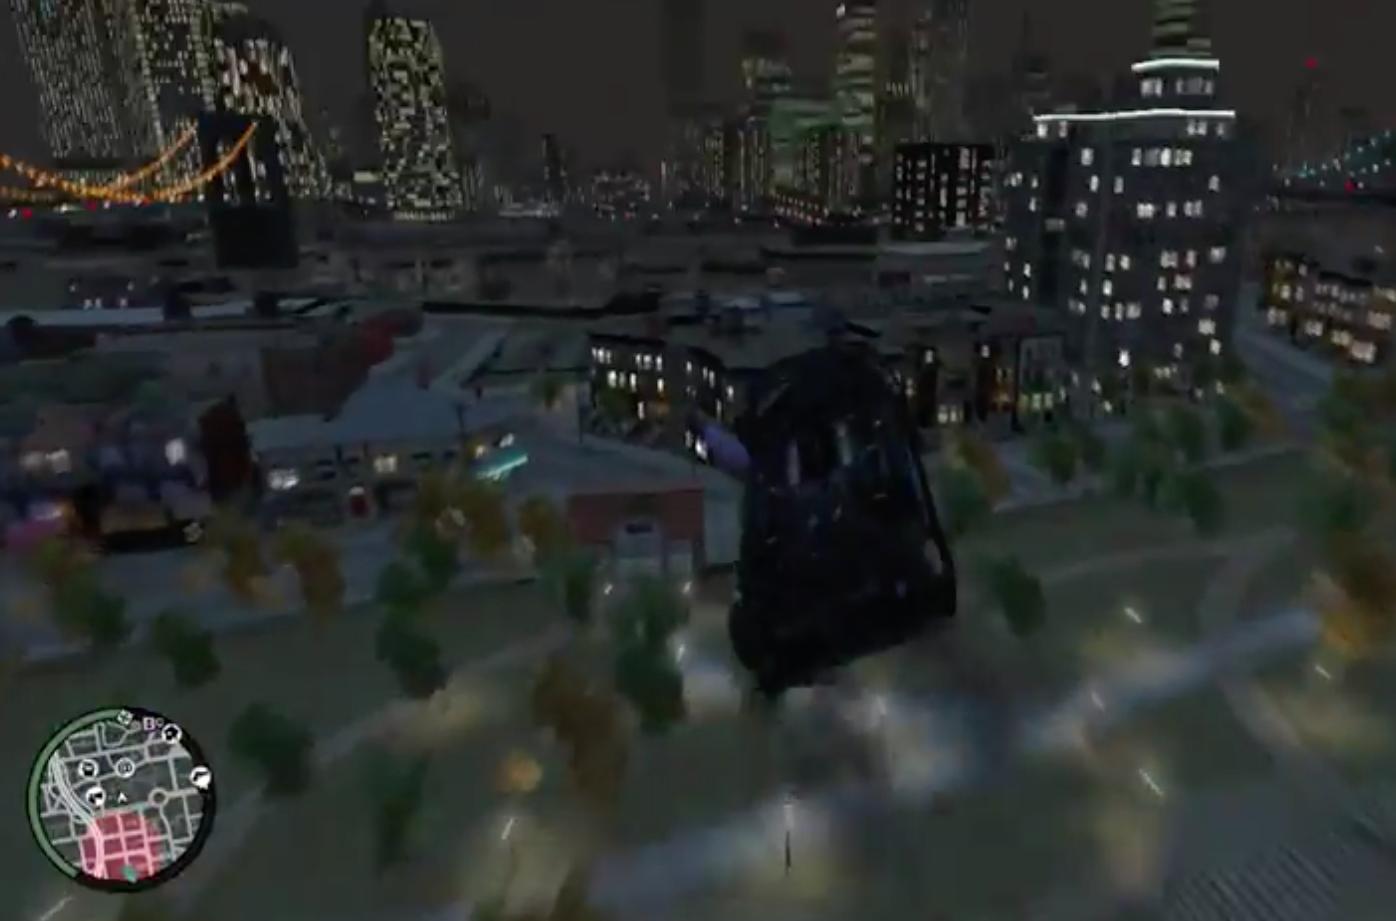 Screenshot 2020 11 10 at 16.29.44 e1605025876527 20 Of The Weirdest Video Game Glitches